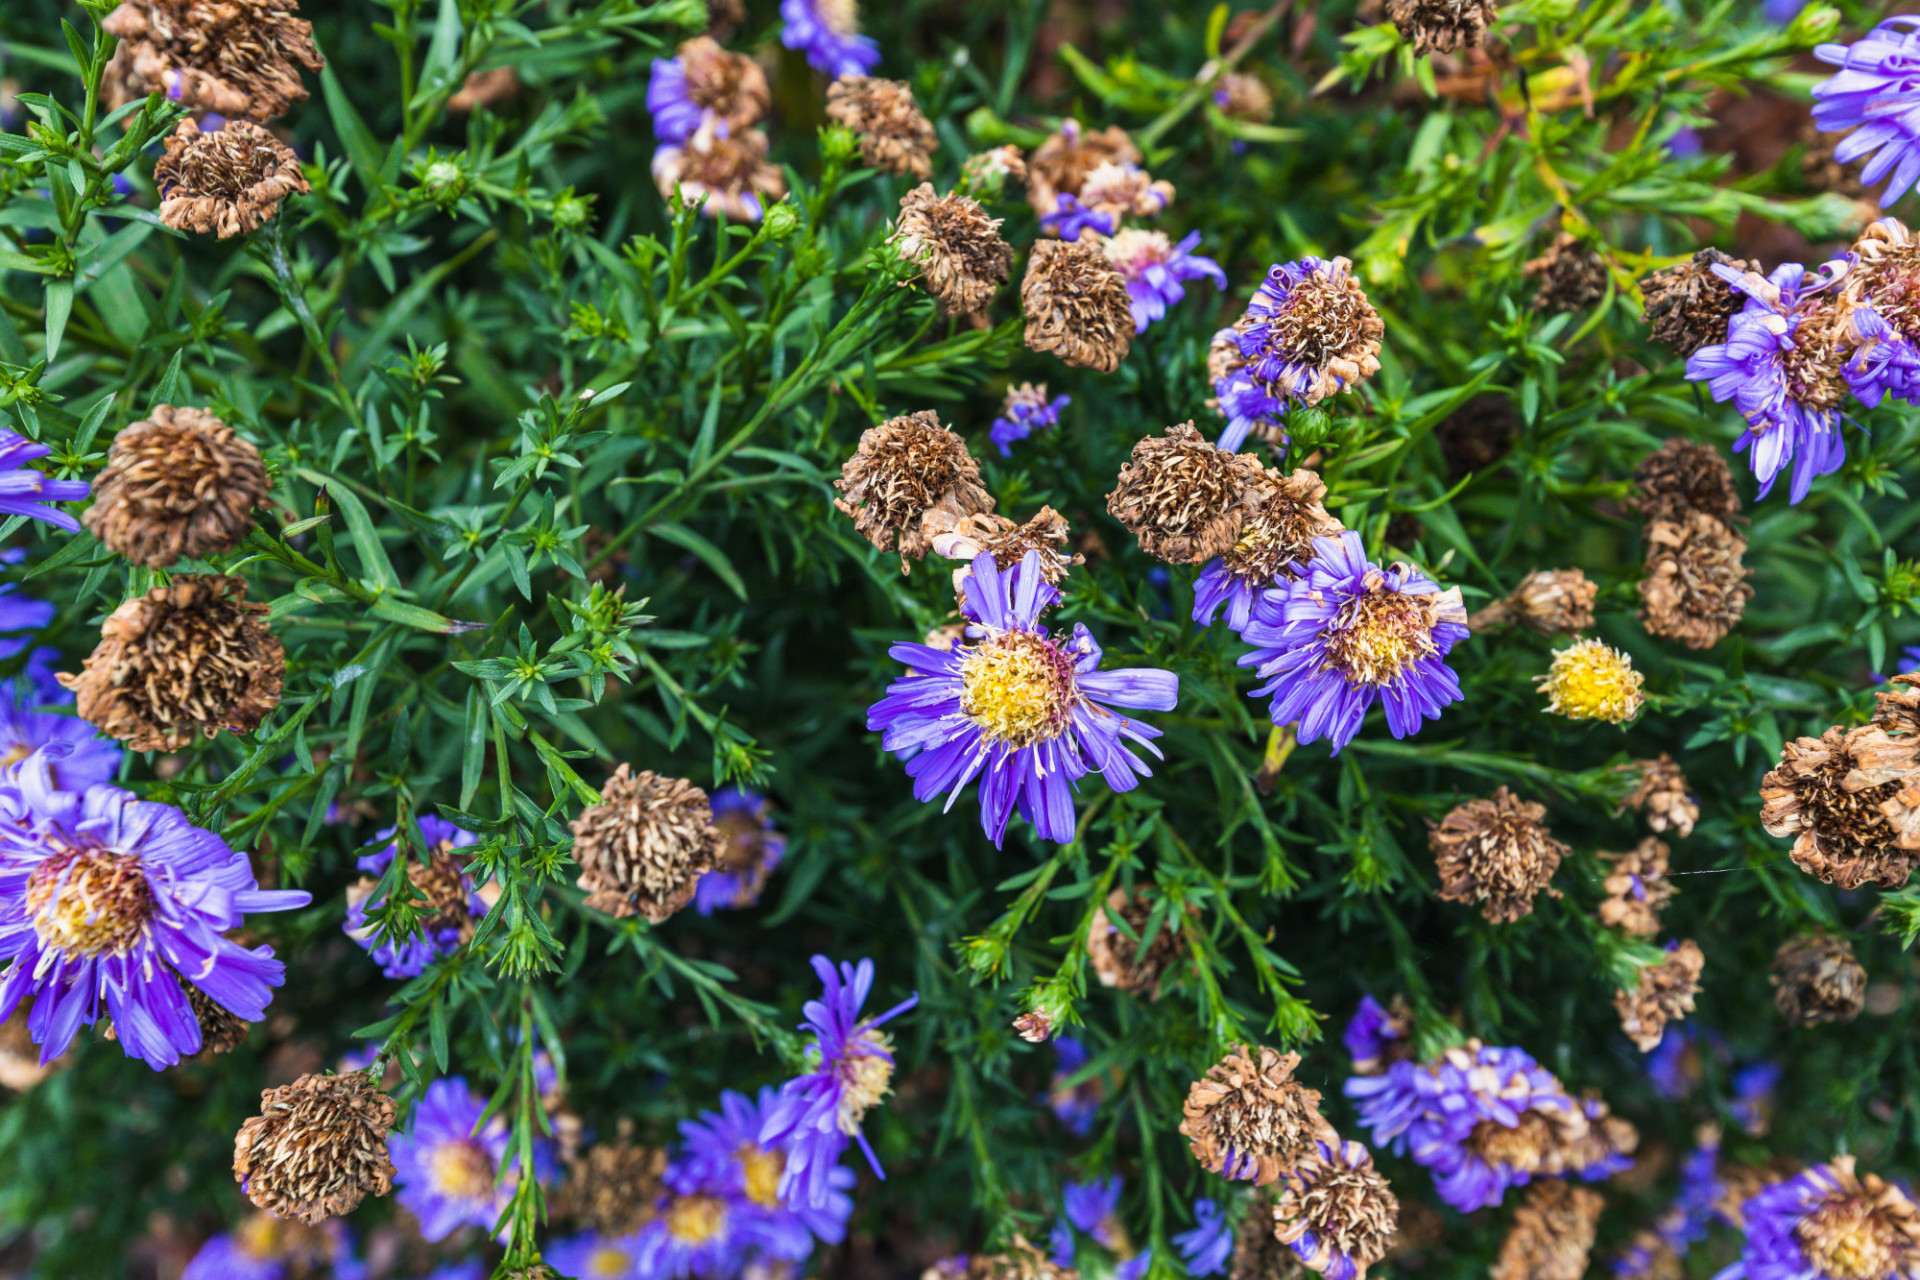 Purple aster flowers in October